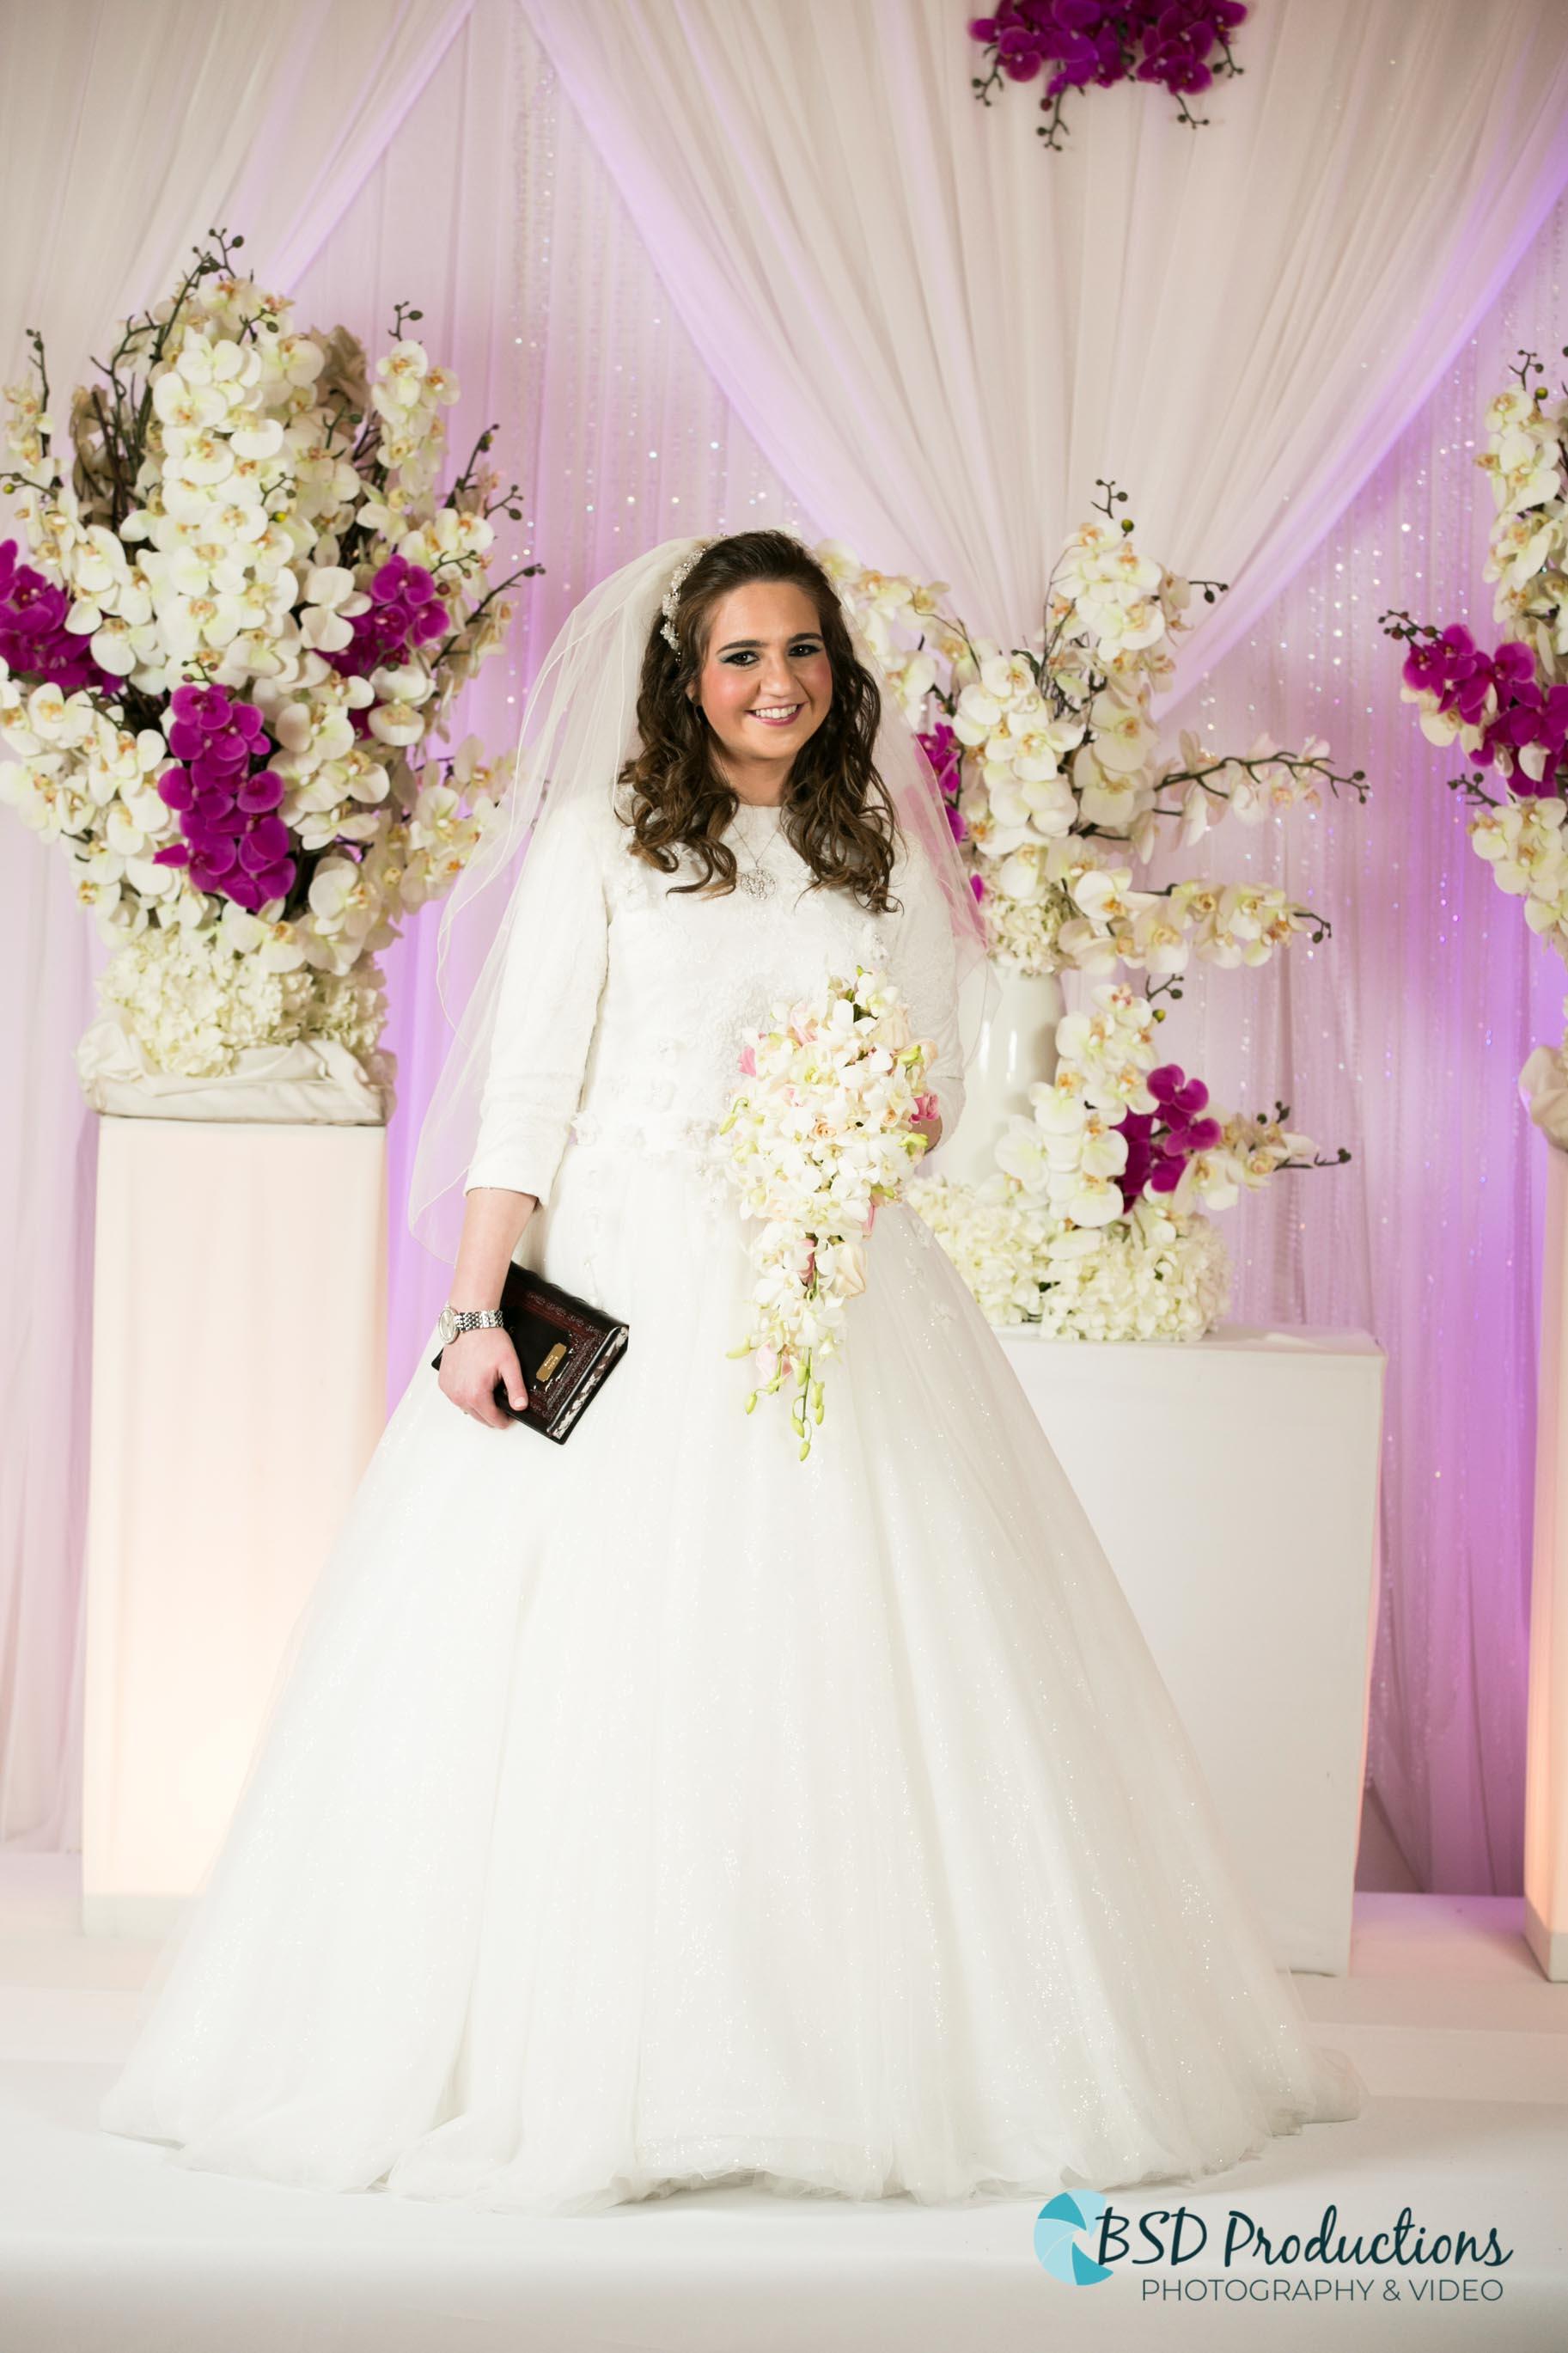 UH5A8300 Wedding – BSD Prodcutions Photography